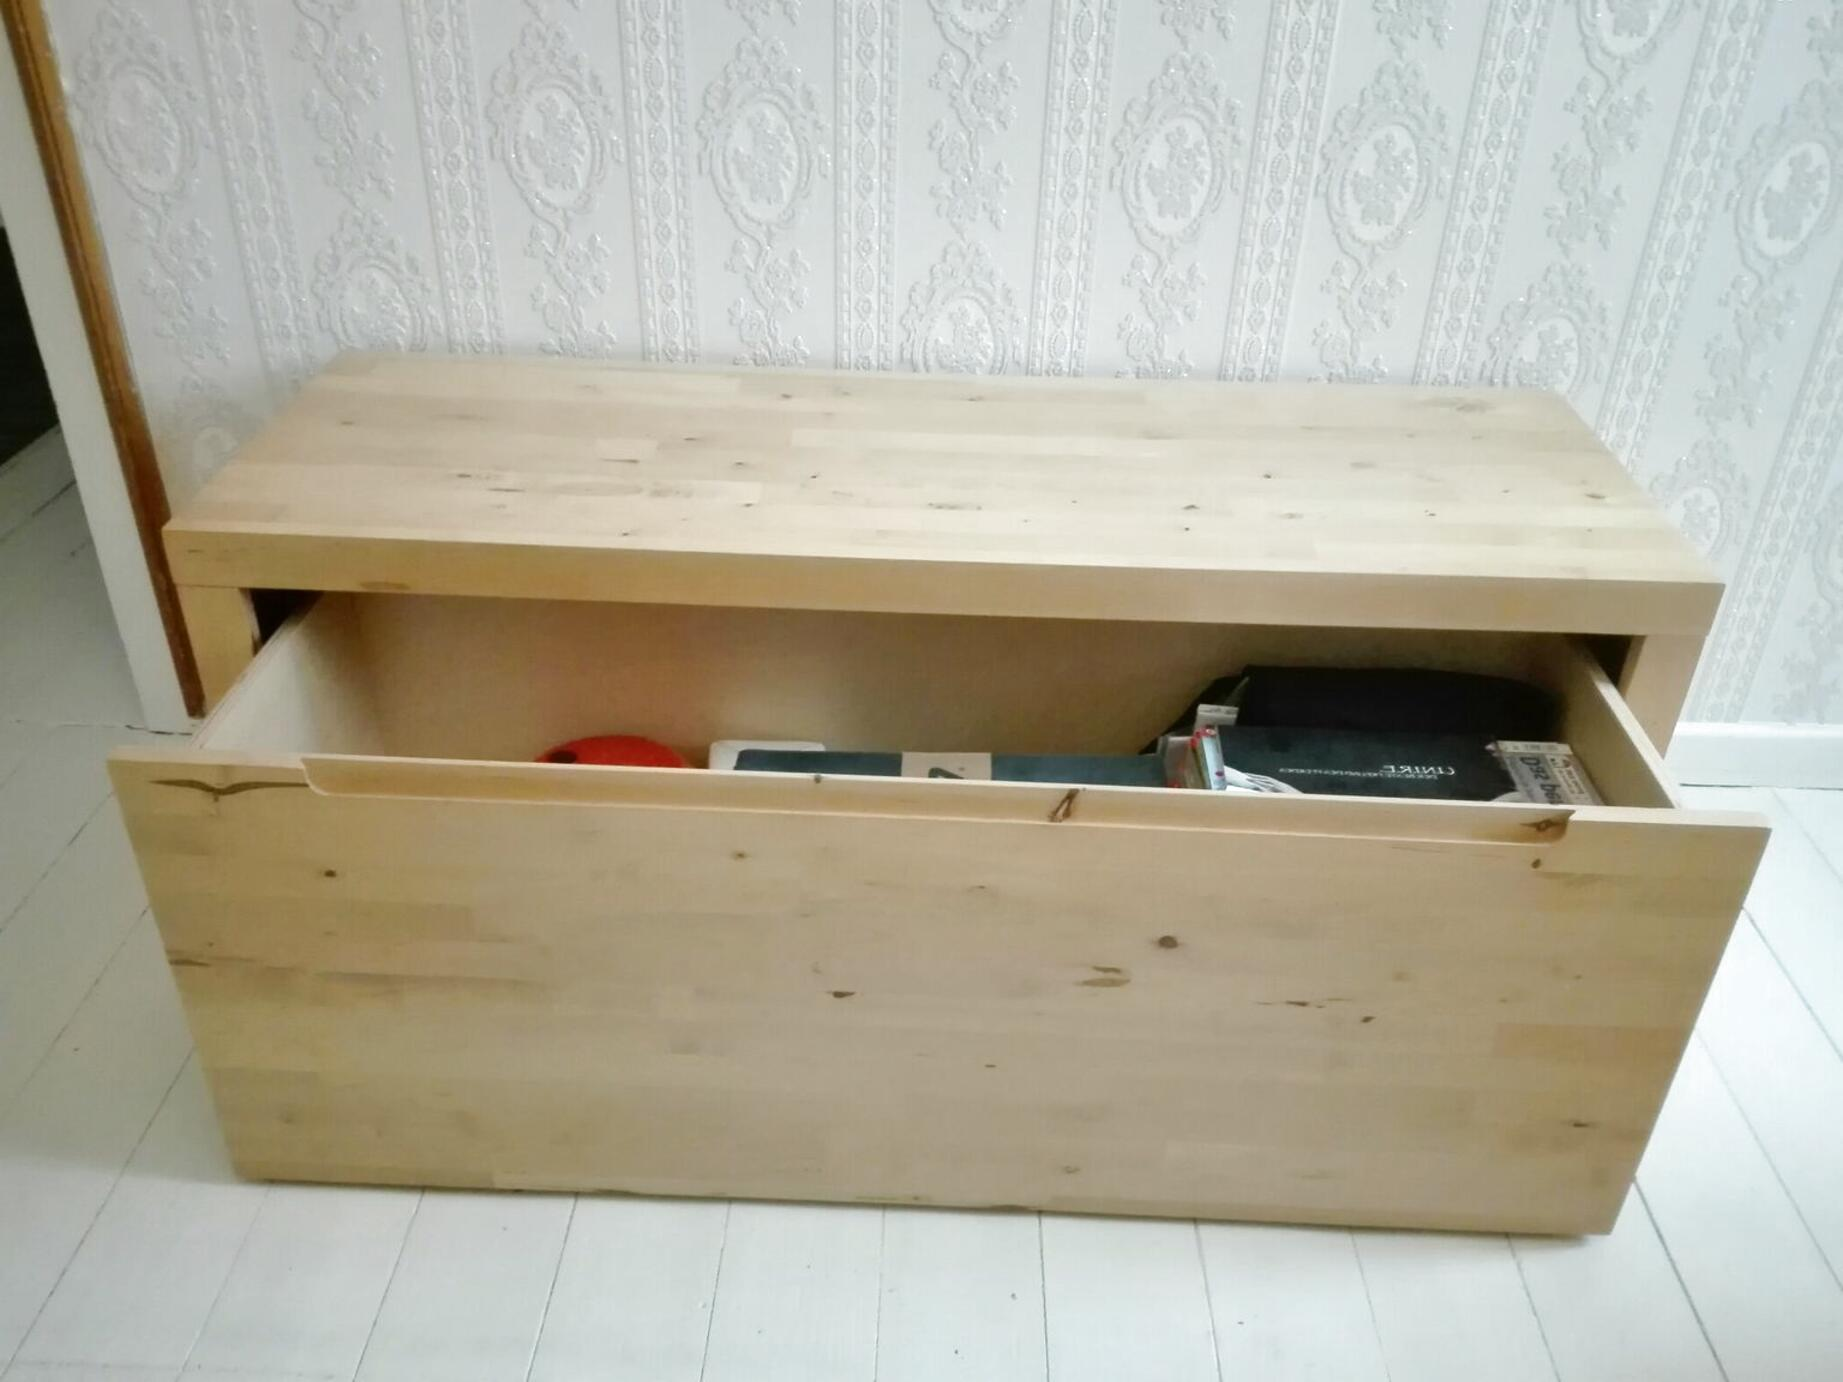 IKEA NORREBO HOLZREGAL mit großer SchubladeTruhe (Regal 1